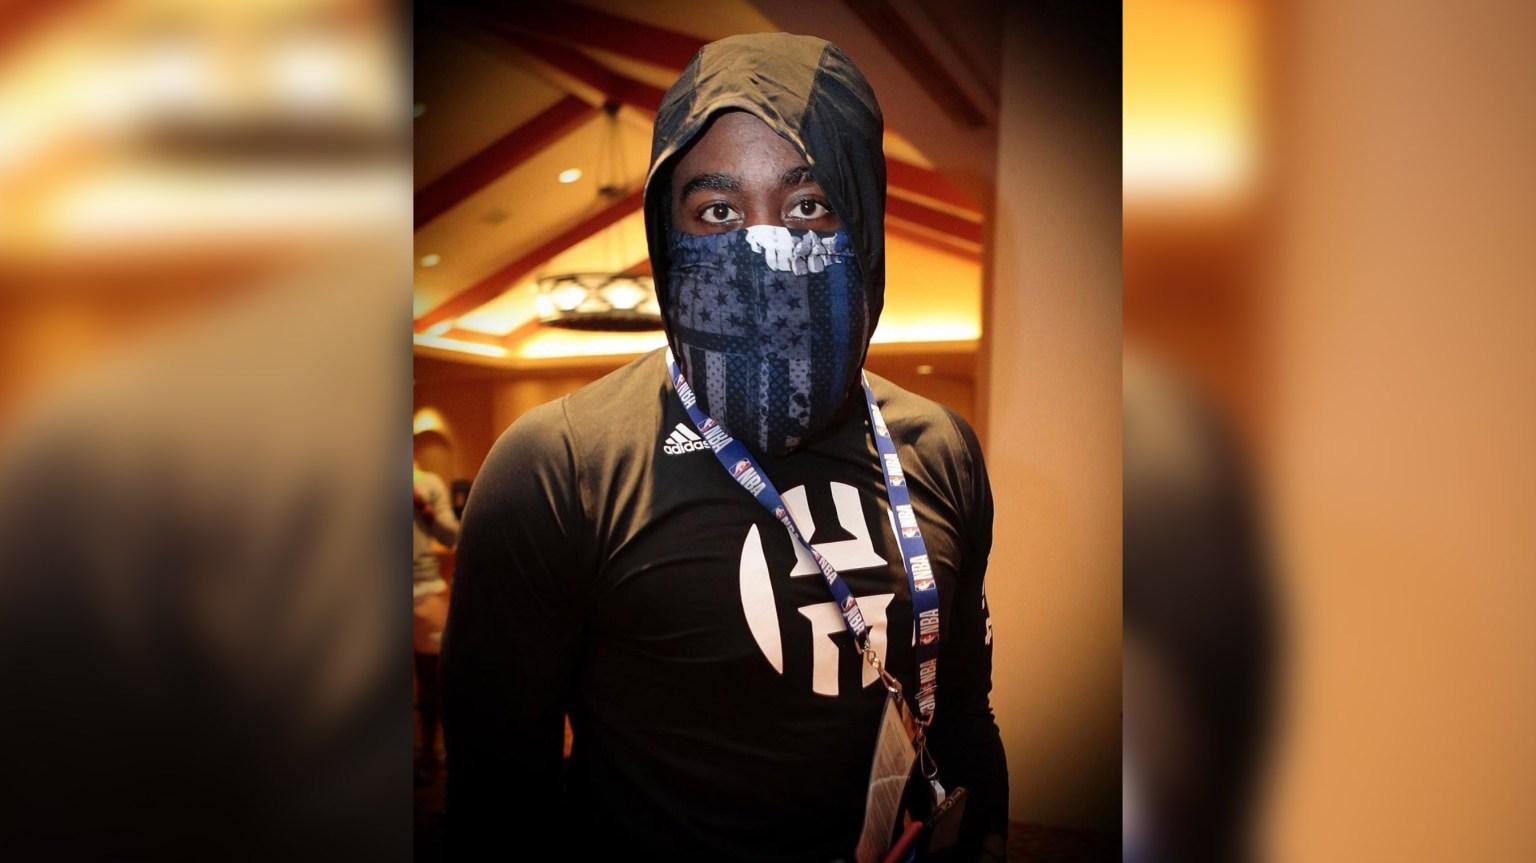 NBA star James Harden criticized for wearing Blue Lives Matter face mask